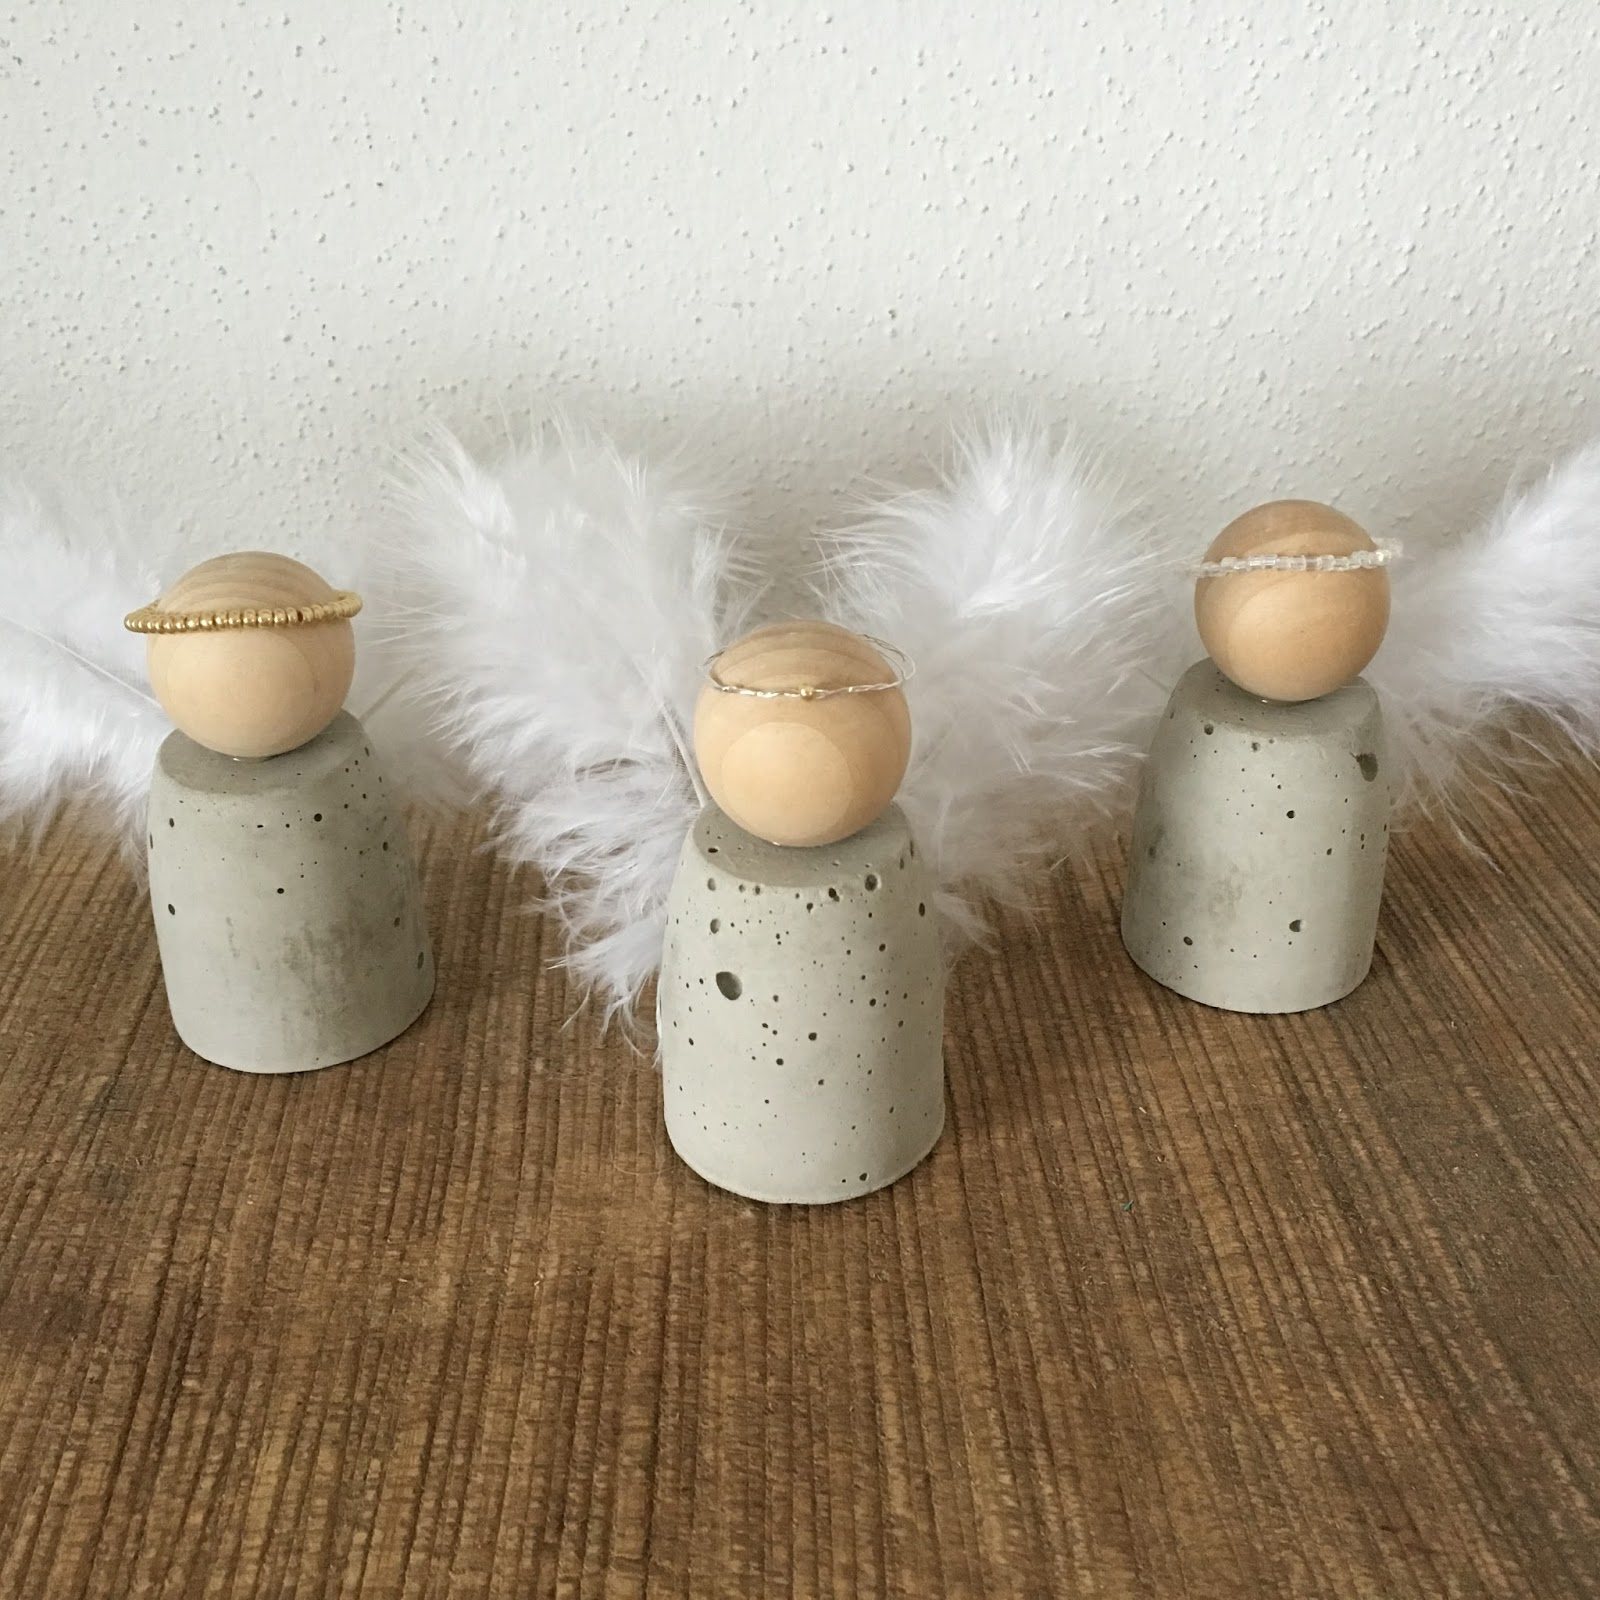 DIY Engel aus Beton